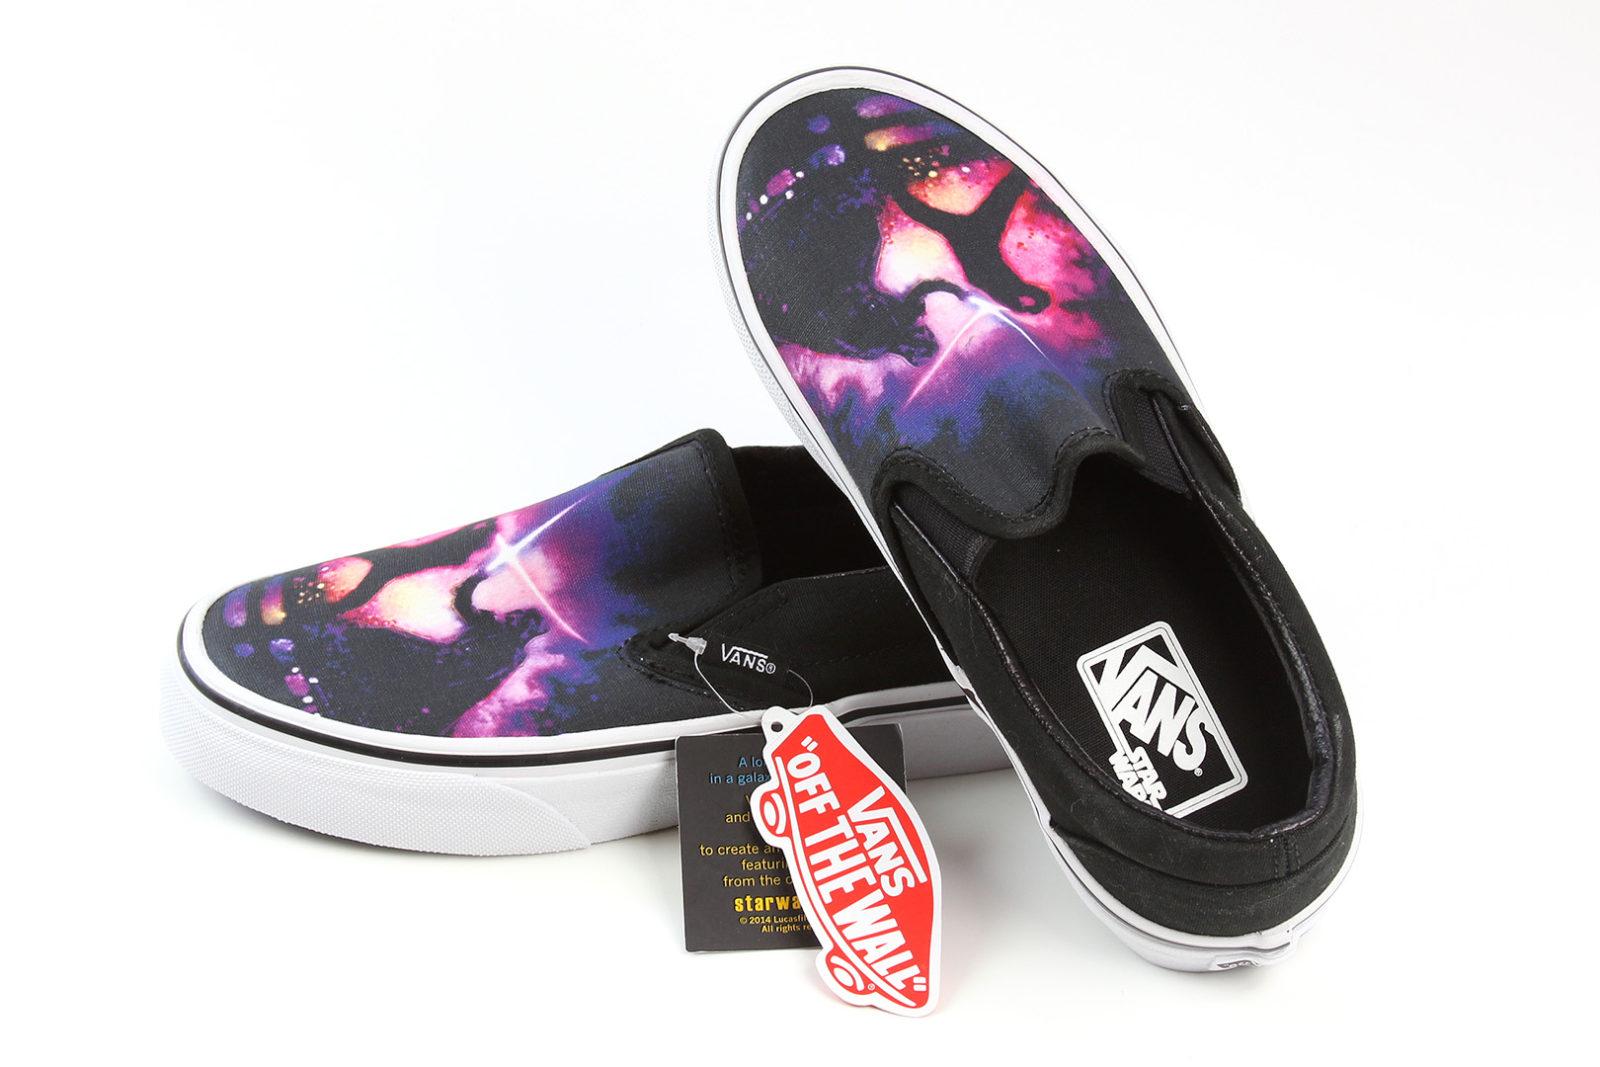 Vans x Star Wars shoes